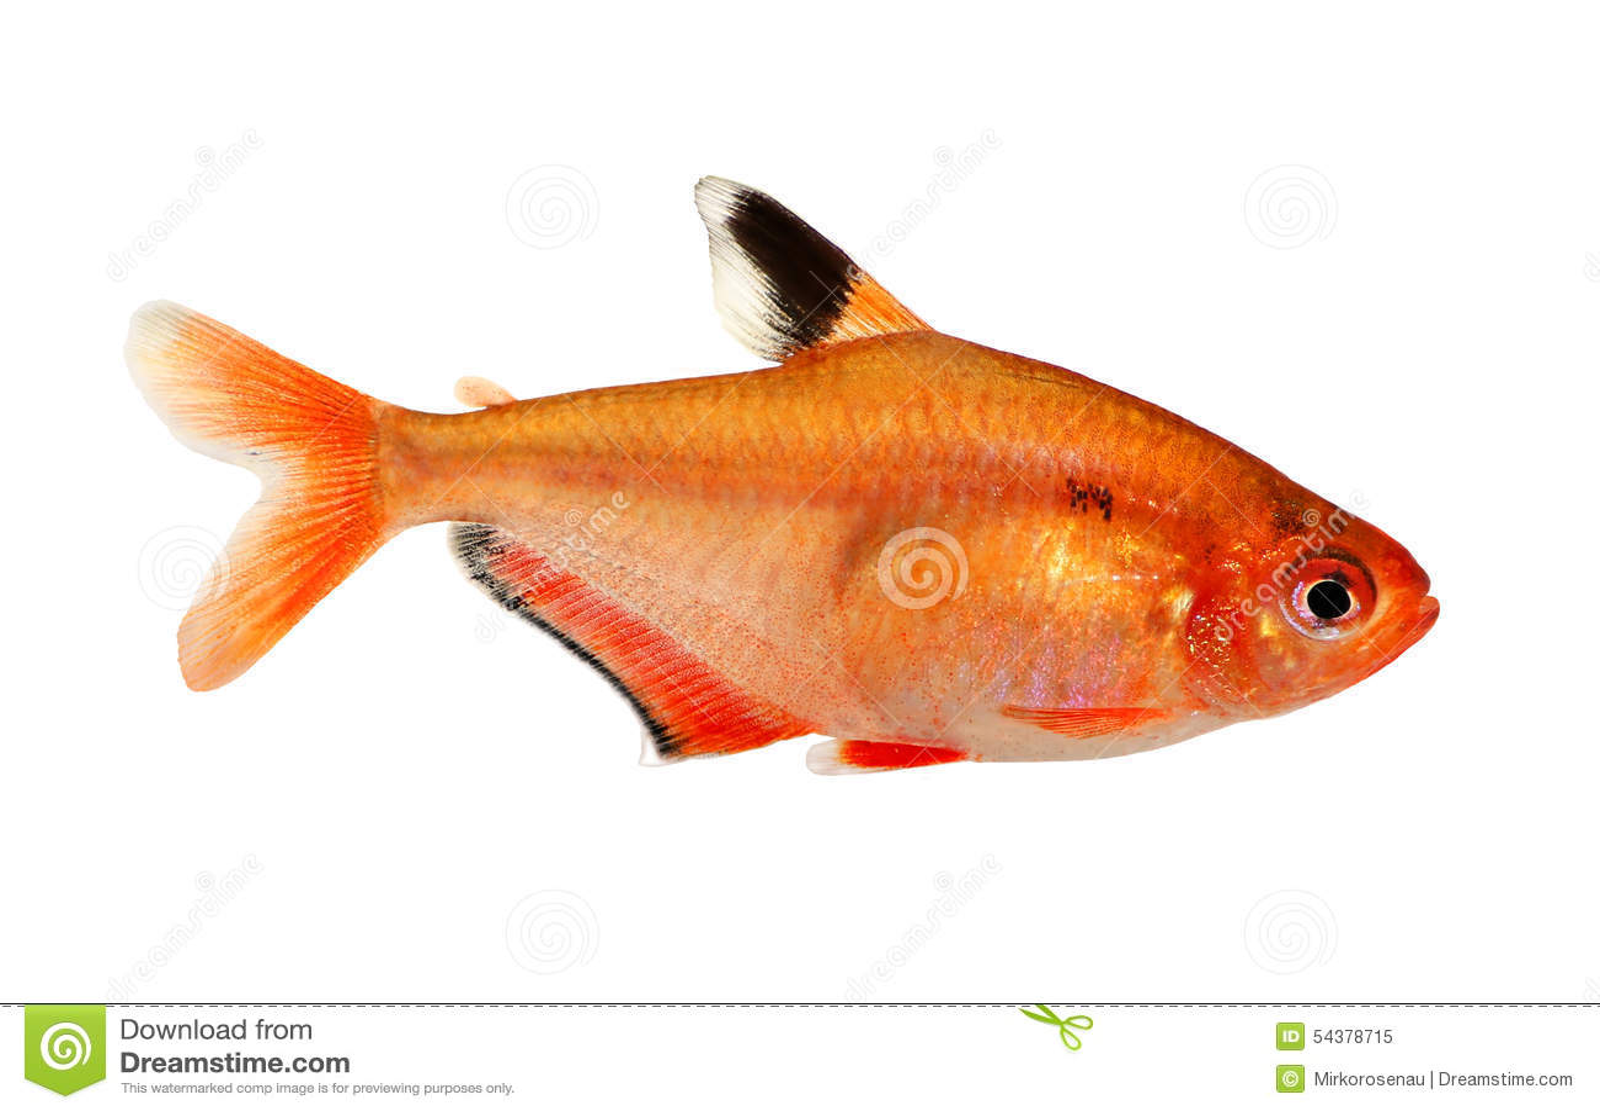 d 39 aquarium de poissons t tra barb hyphessobrycon eau douce d 39 eques de serape de serpae d. Black Bedroom Furniture Sets. Home Design Ideas